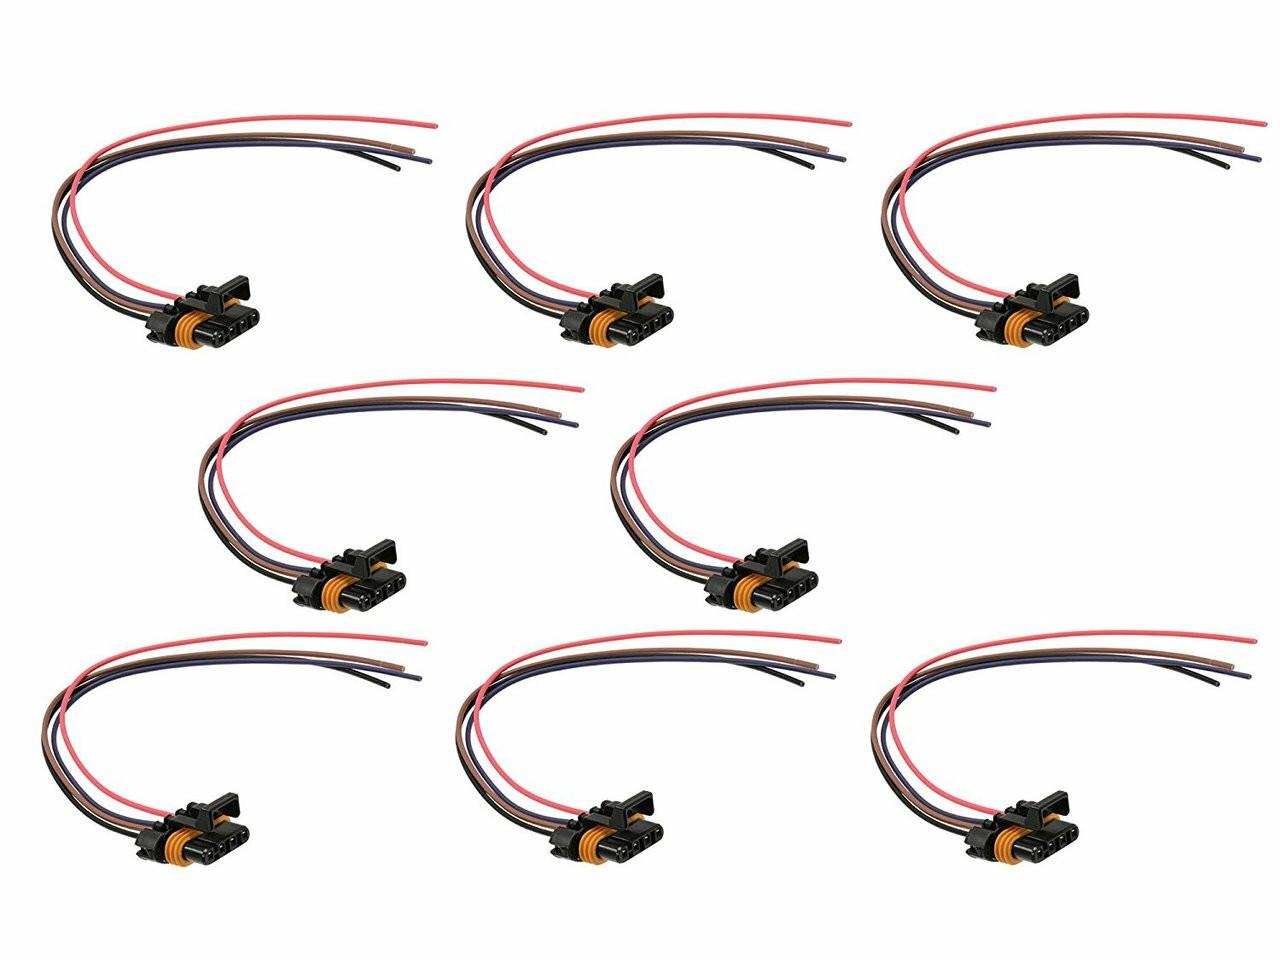 77641 Firestormtm Interconnect Ls Odd Ignition Coil Wiring Harness